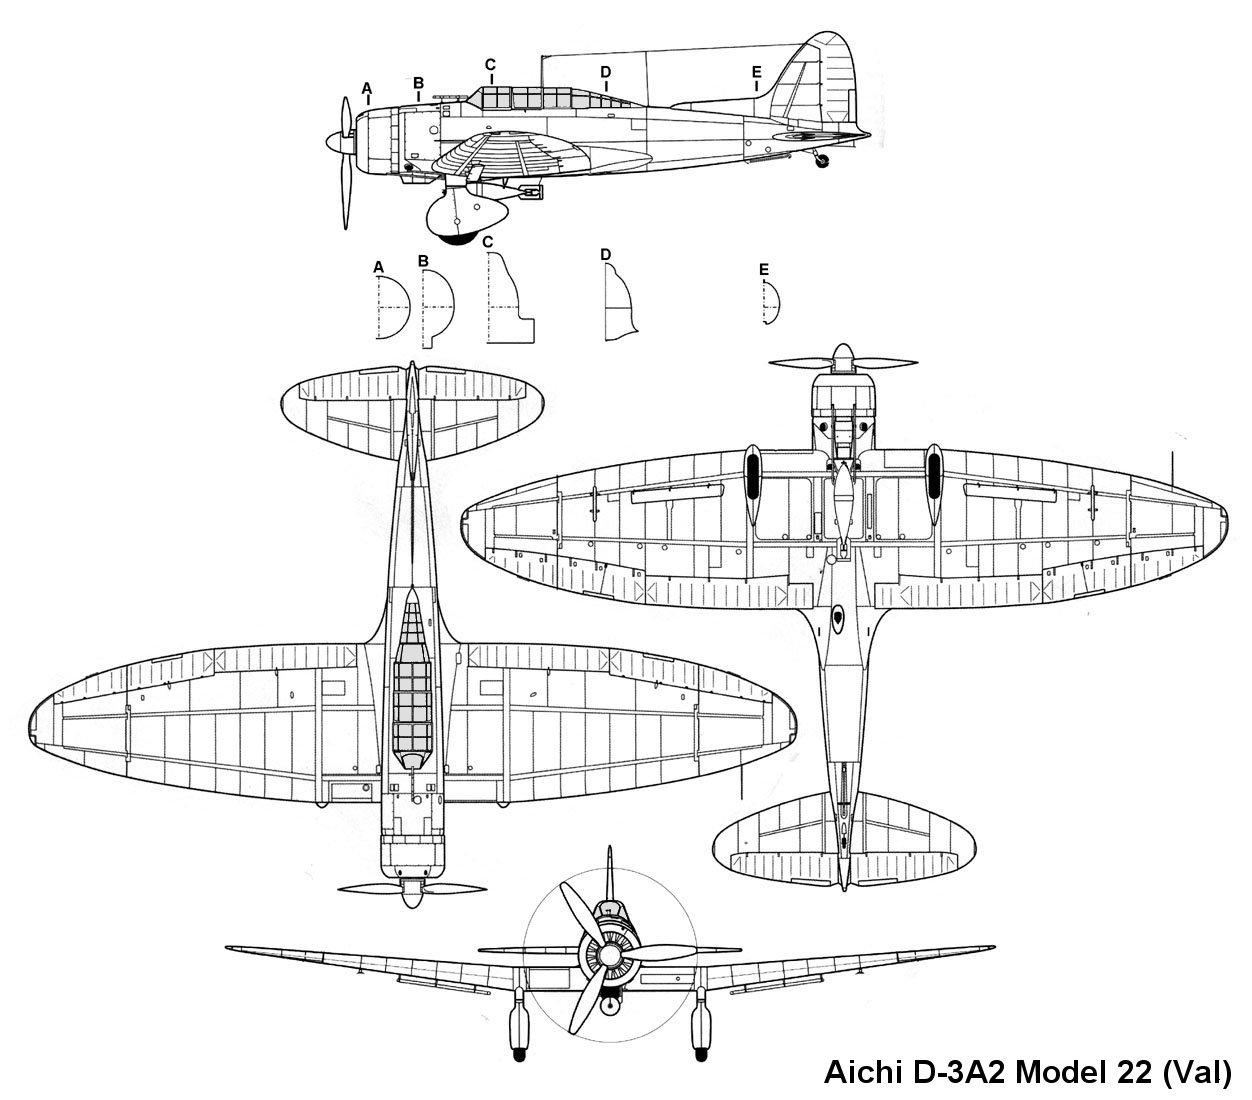 Aichi D3a Type 99 Val Info